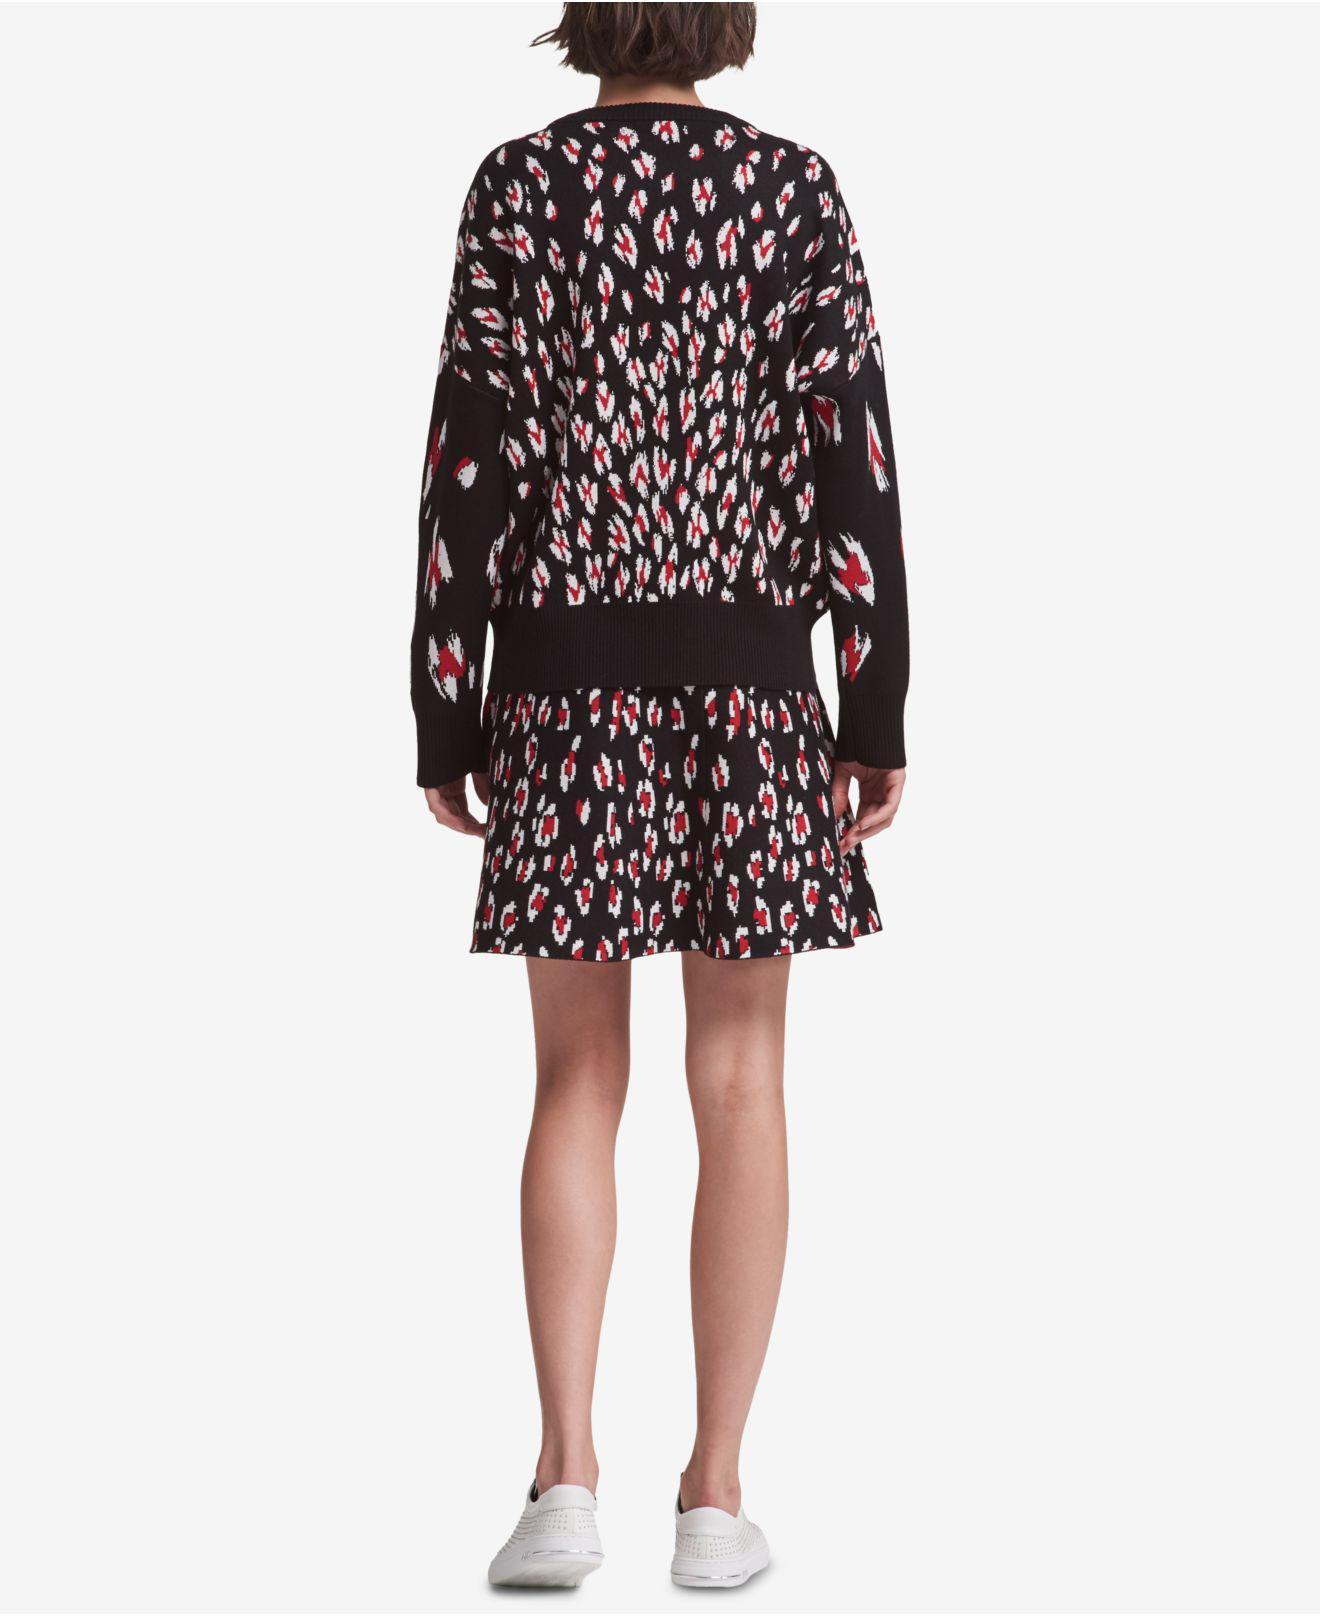 c2e14a29fc0b DKNY Leopard-print Sweater, Created For Macy's - Lyst